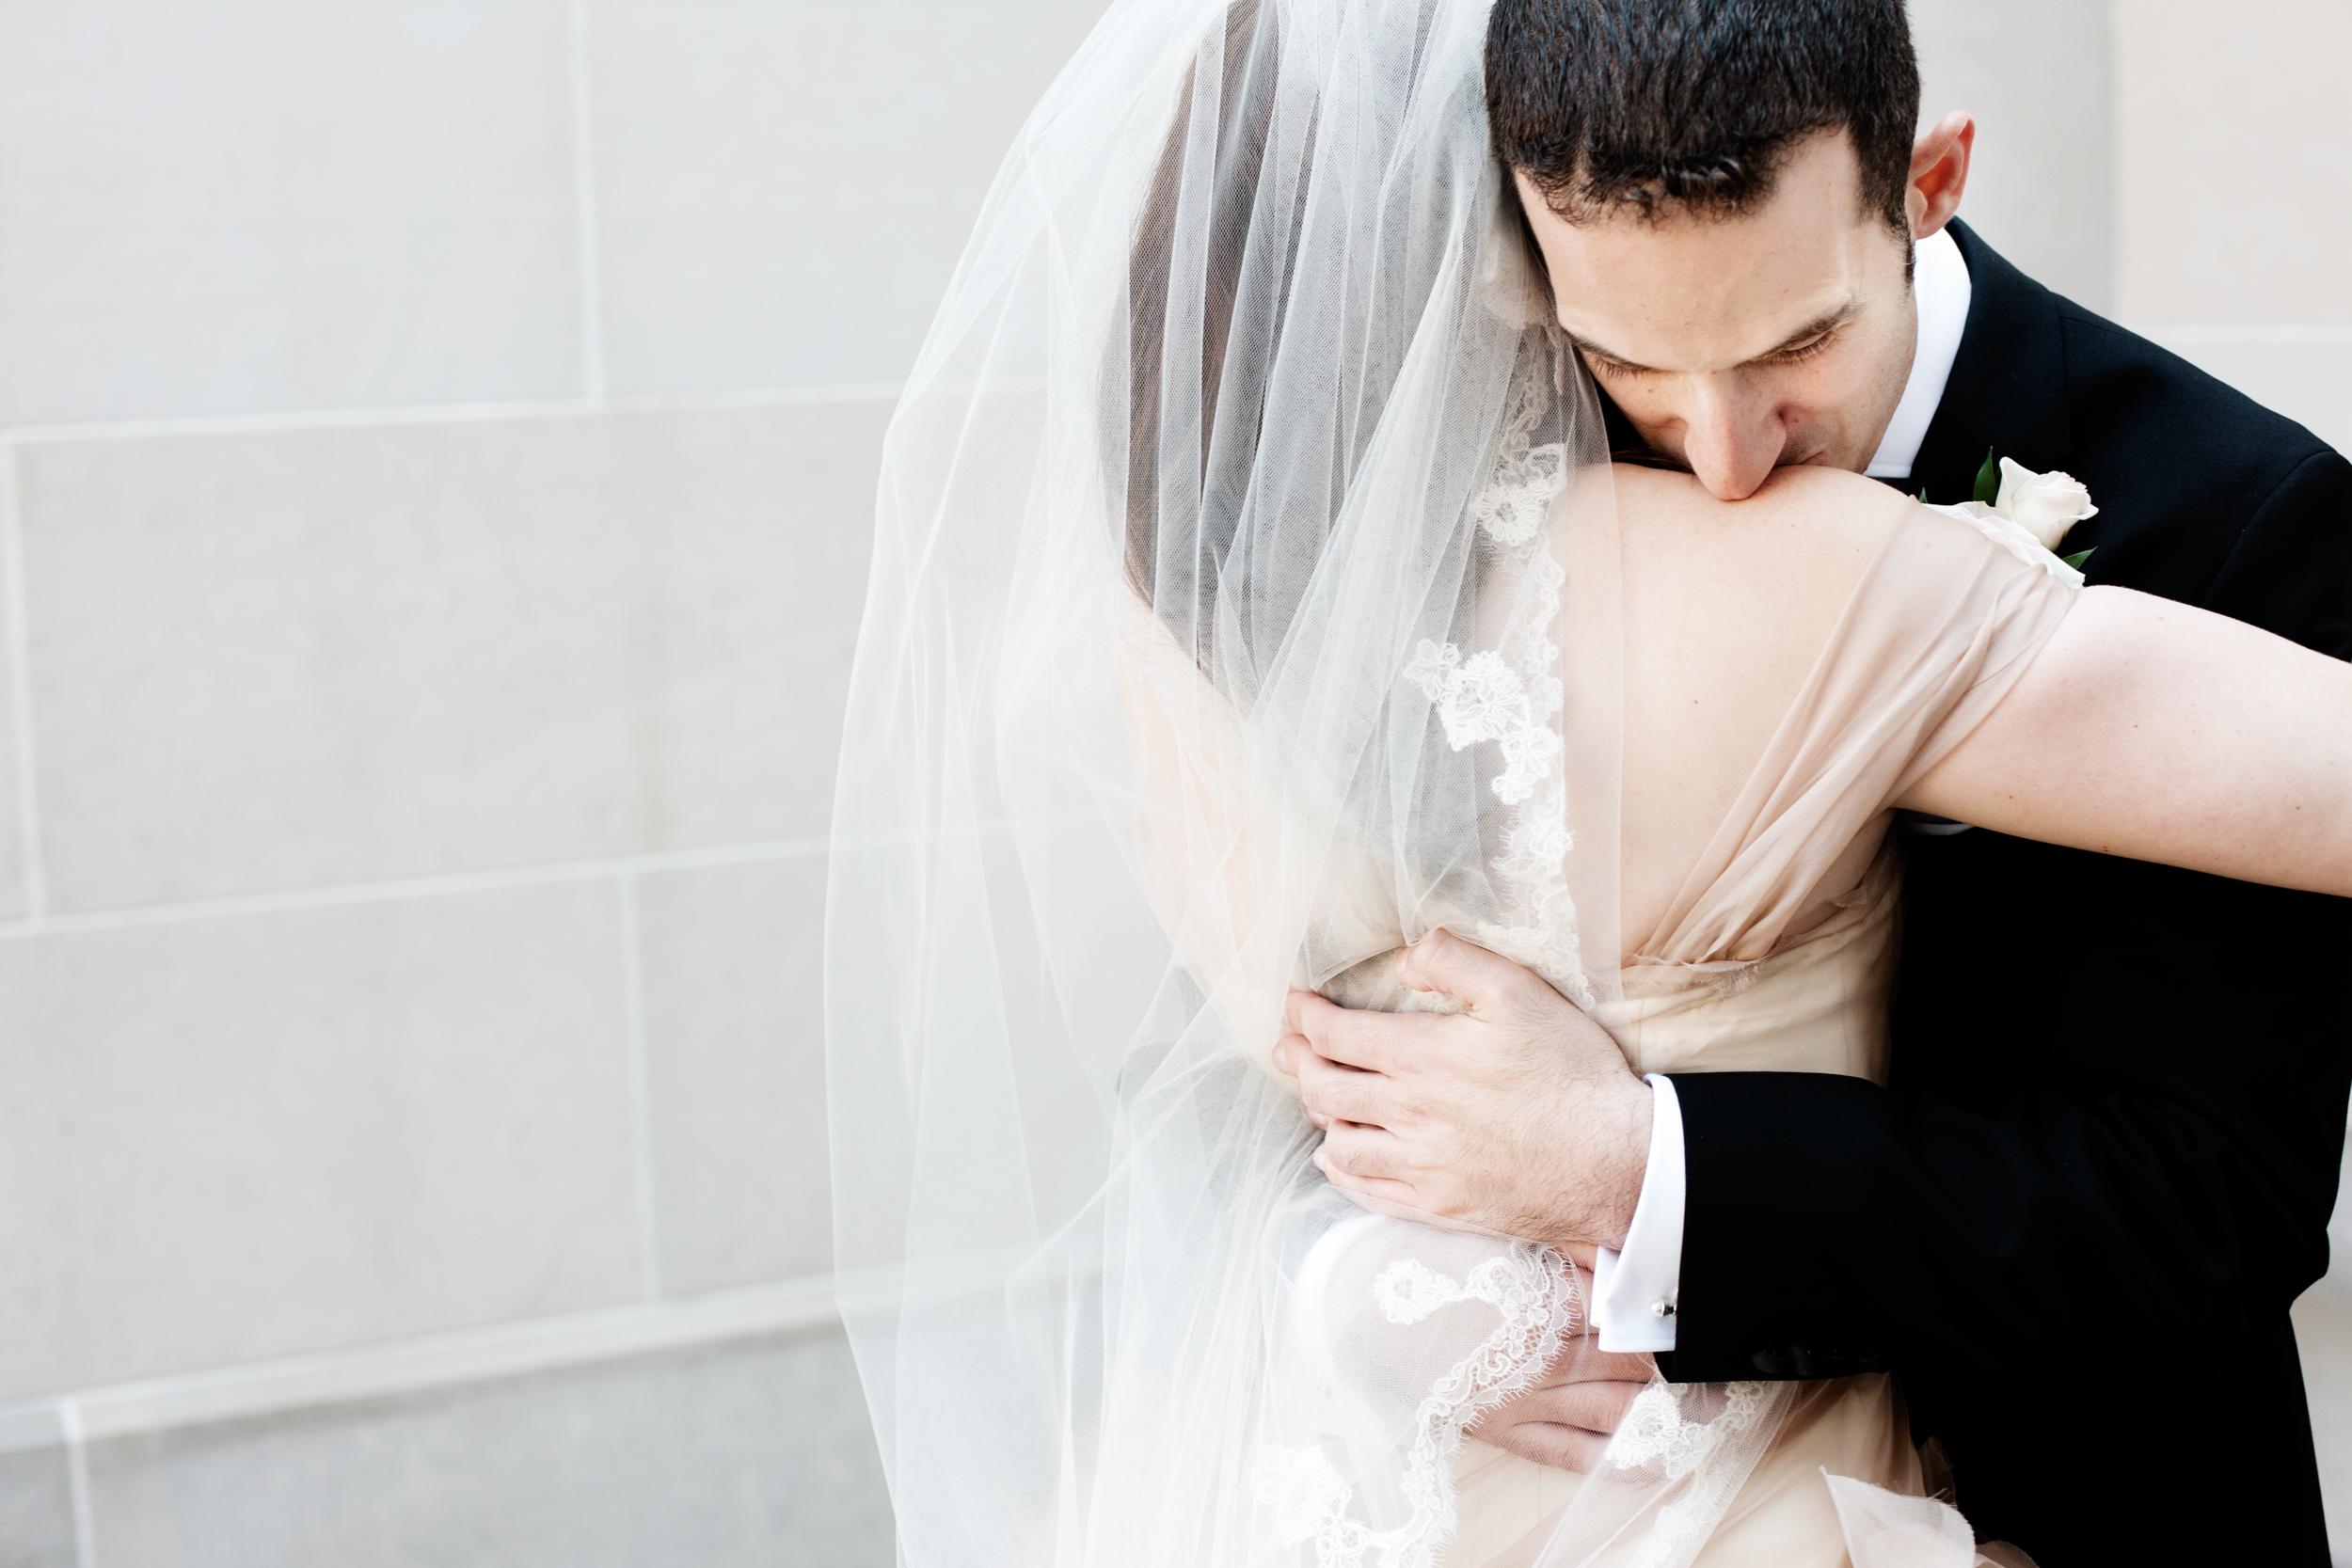 Ceci_New_York_Ceci_Style_Ceci_Johnson_Luxury_Lifestyle_Floral_Lace_Wedding_Letterpress_Inspiration_Design_Custom_Couture_Personalized_Invitations_-116.jpg